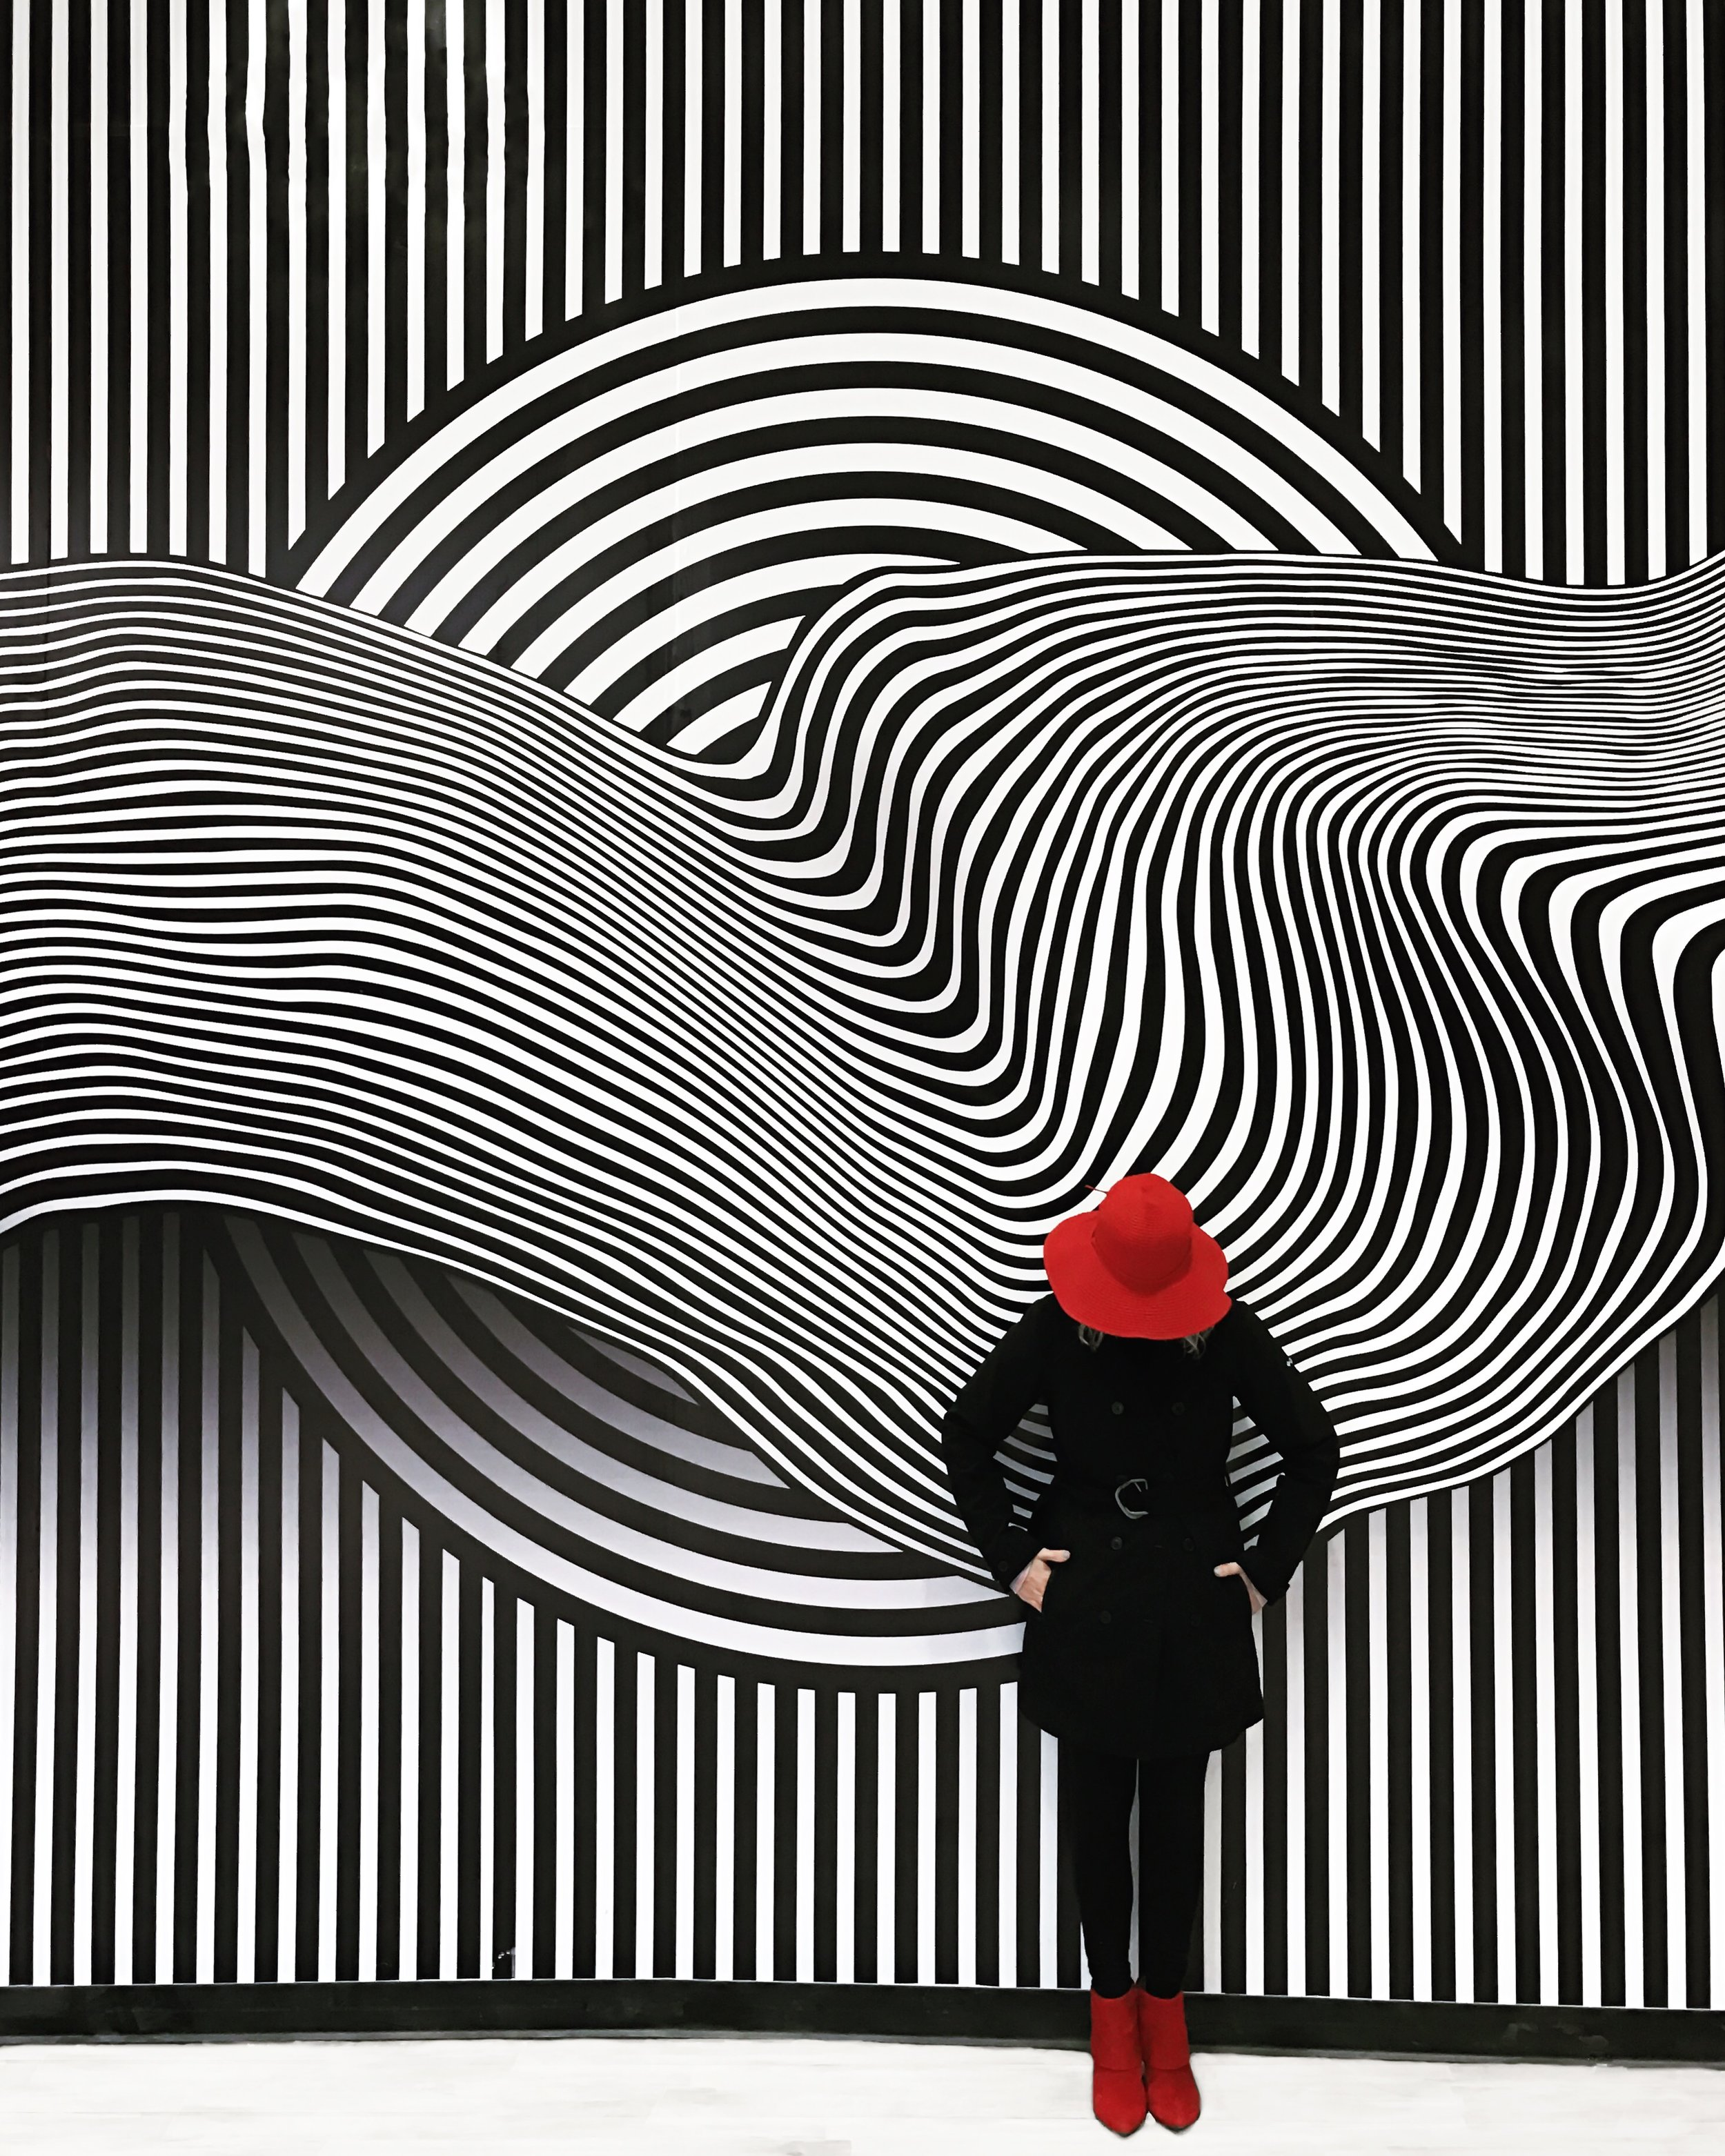 Art Walls at Galleria of Edina, MN     Created over 3,000 square feet of artistic, interactive art walls. A collaboration between Galleria Shops of Edina and Art of Edina.